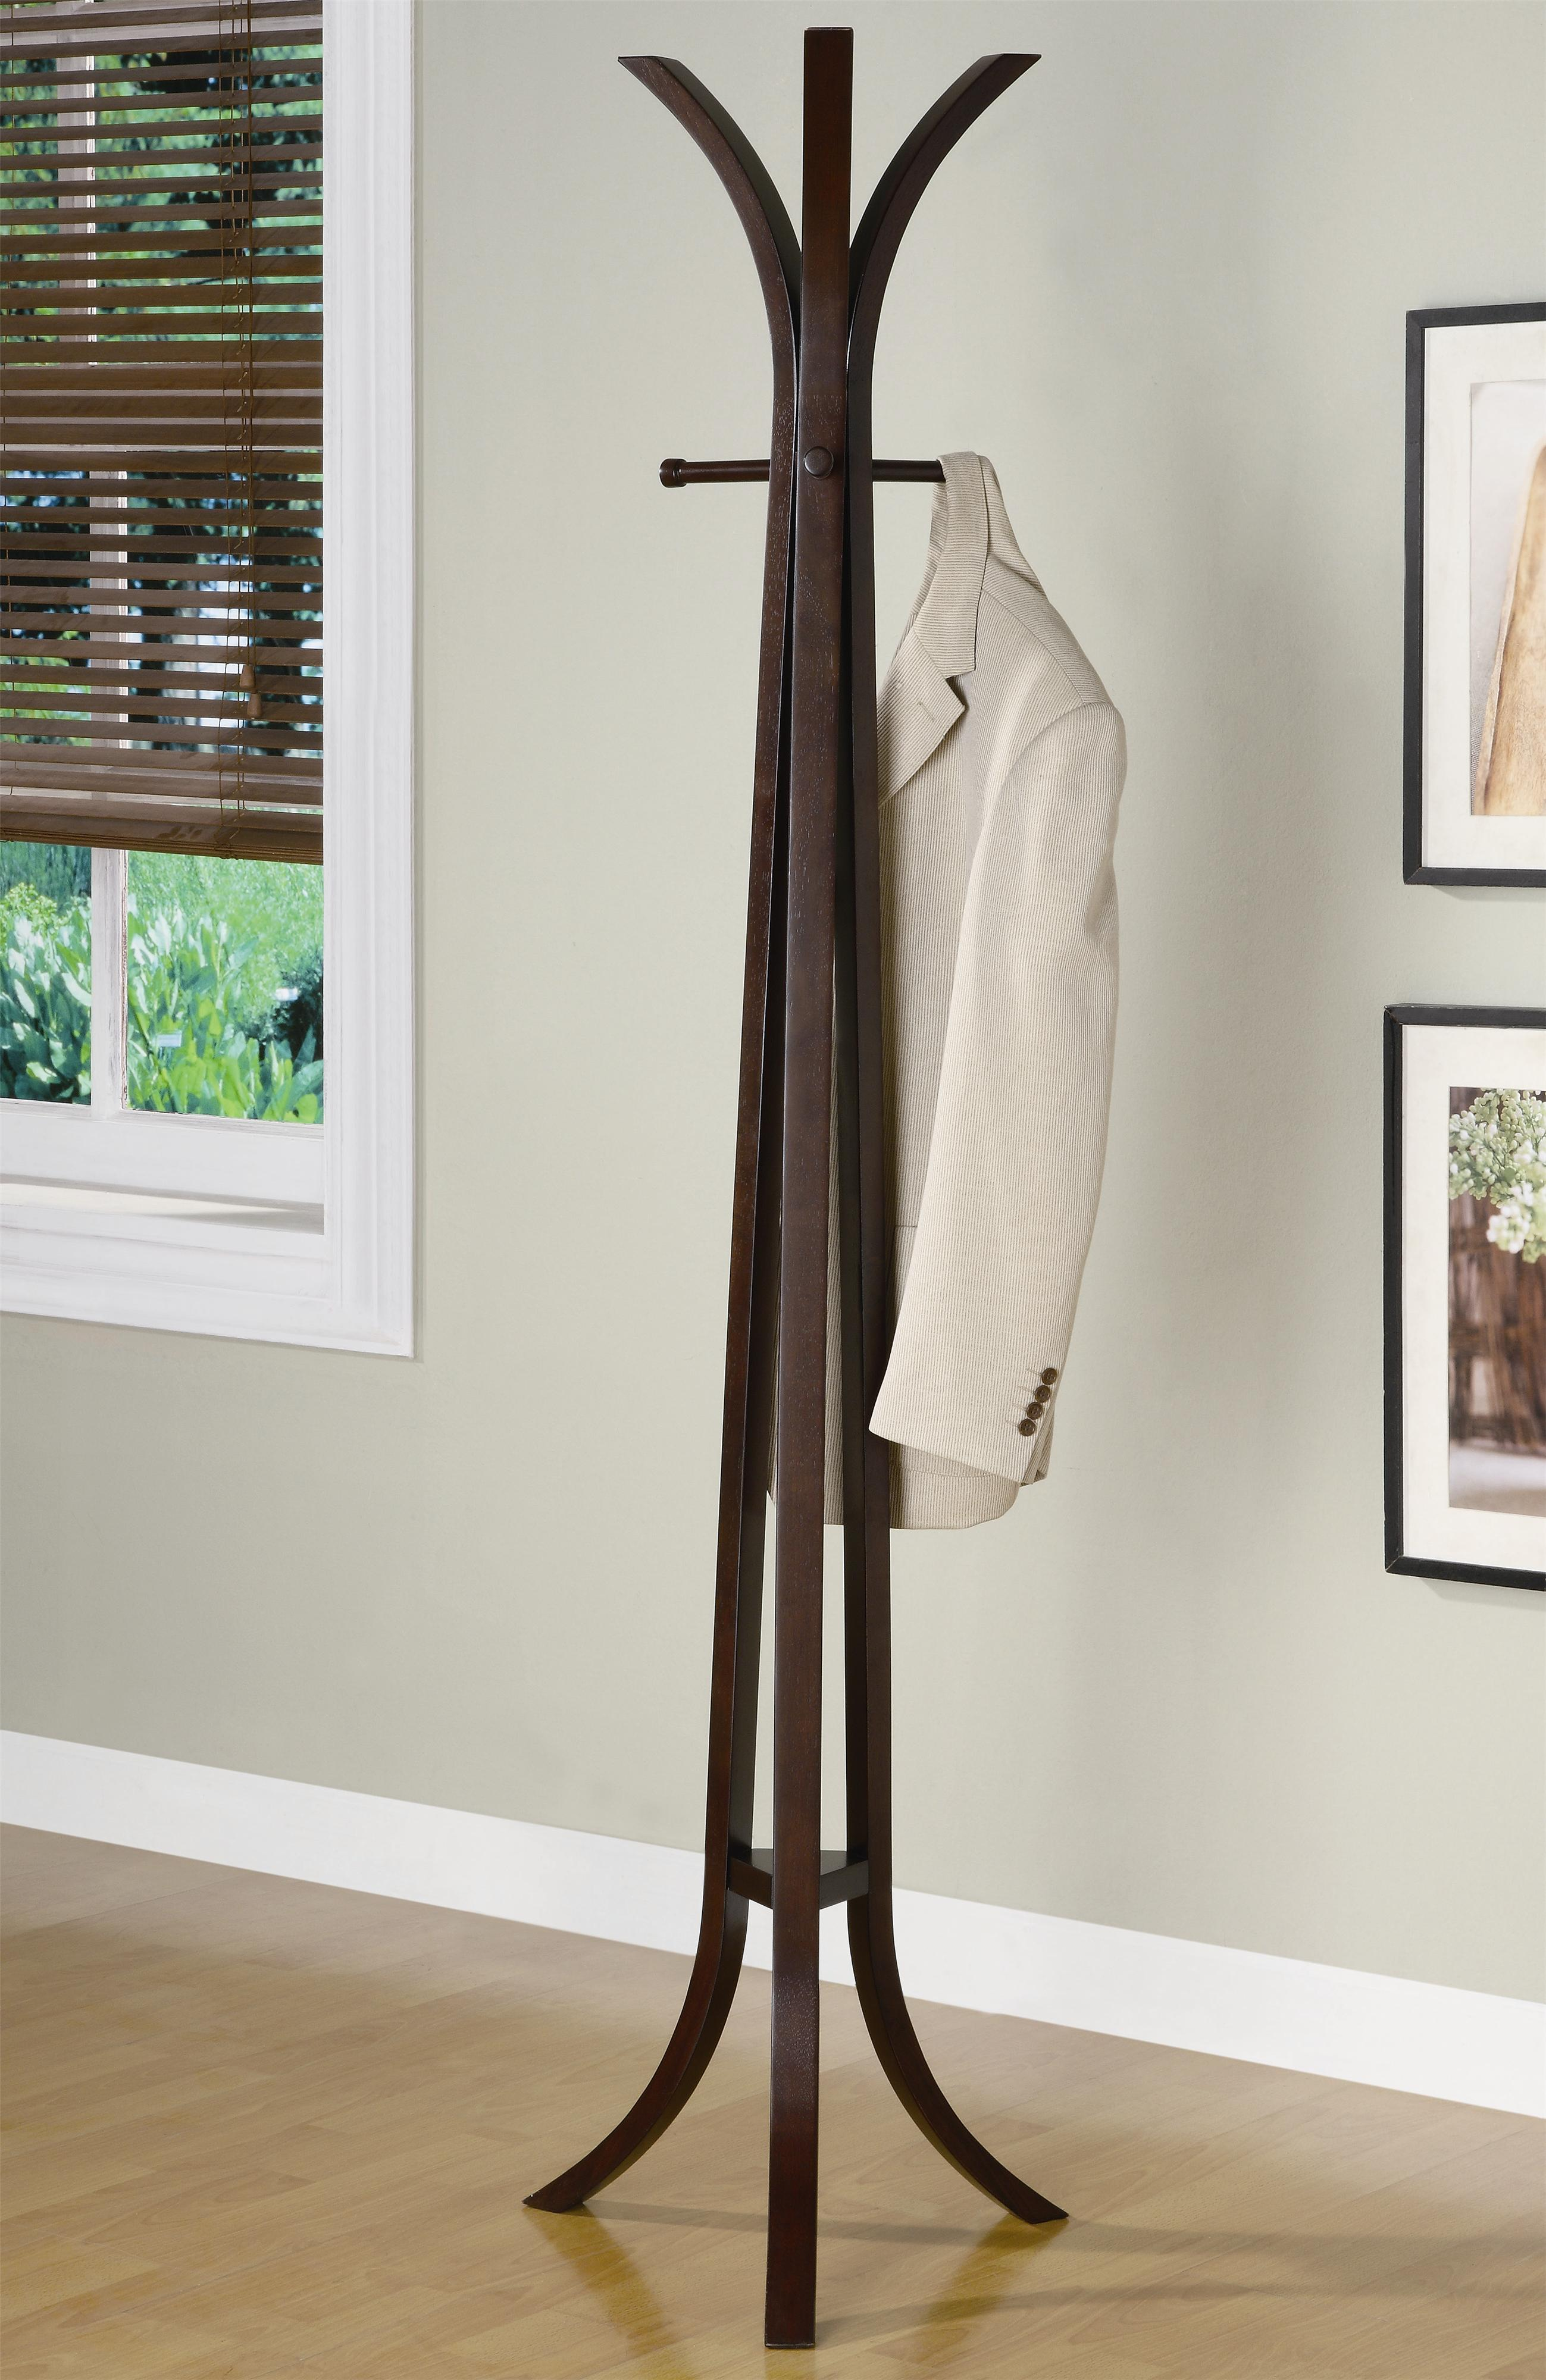 Coaster Coat Racks Coat Rack - Item Number: 900816